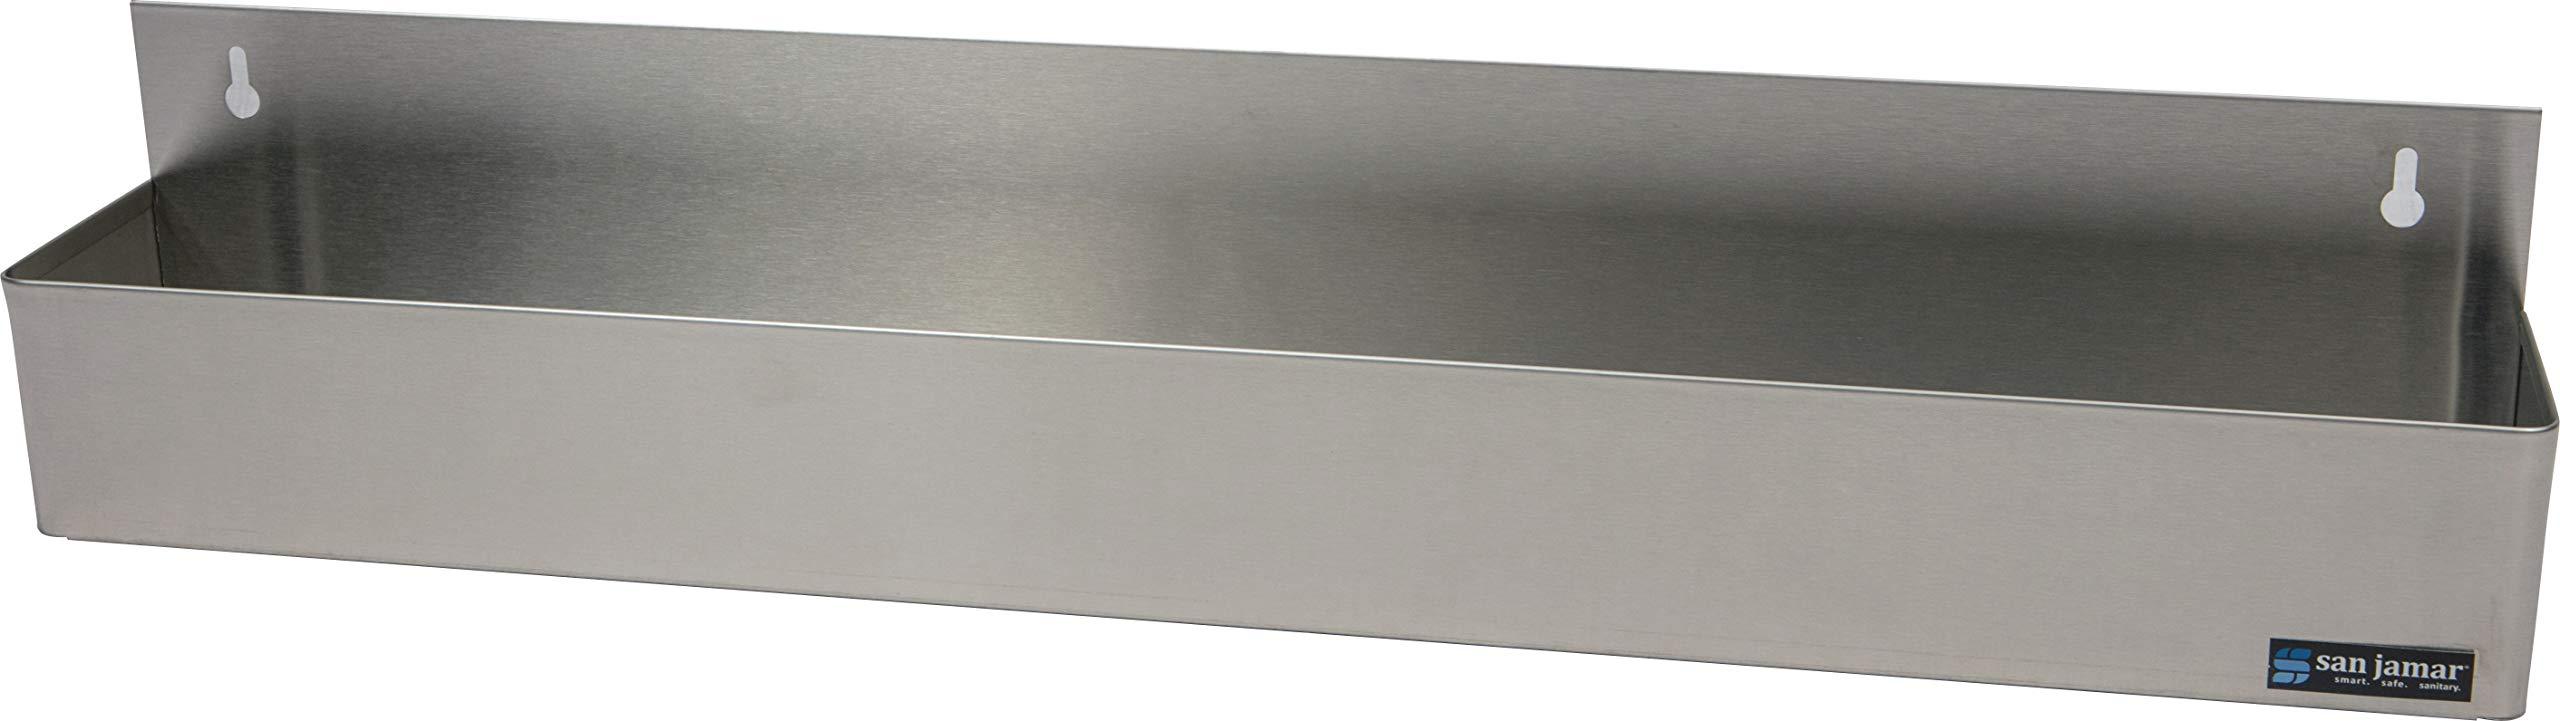 San Jamar B5532 Stainless Steel Single Rail Speed Rack Bottle Holder, 31-1/8'' Width x 6'' Height x 4-1/8'' Depth